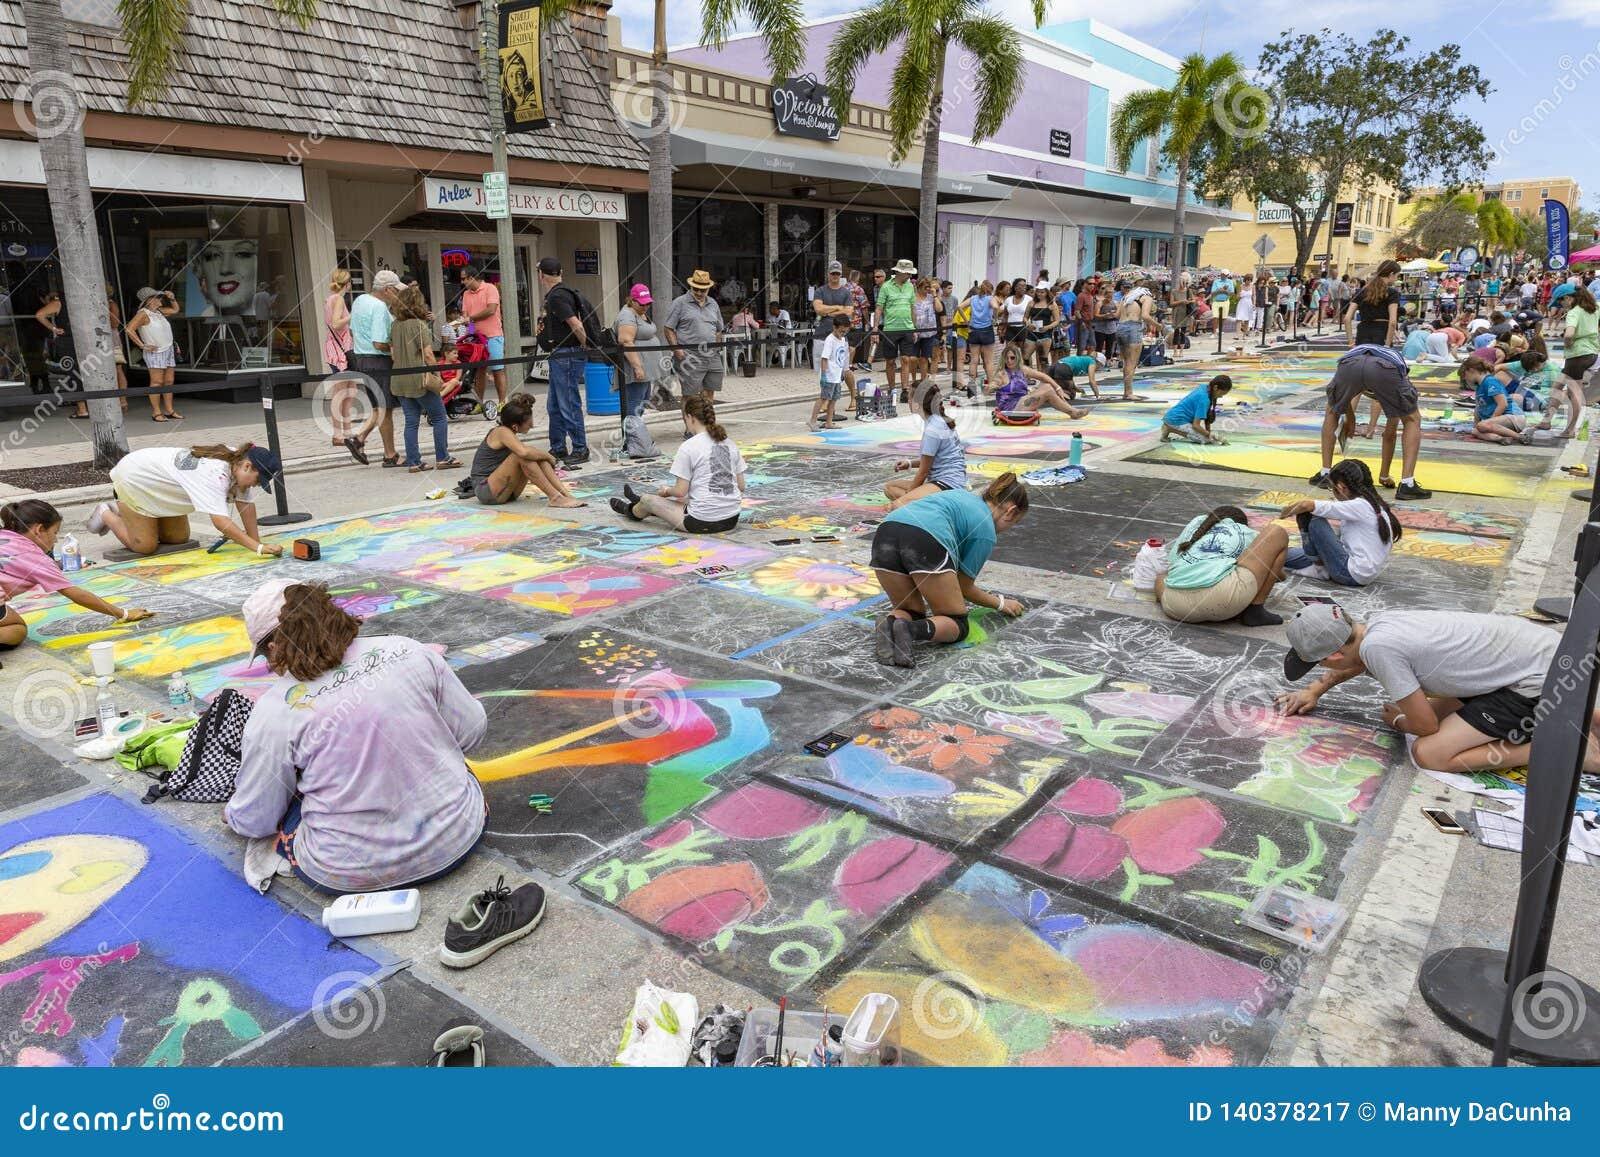 Lake Worth, Florida, USA Fab 23-24, 2019 25Th Annual Street Painting Fest